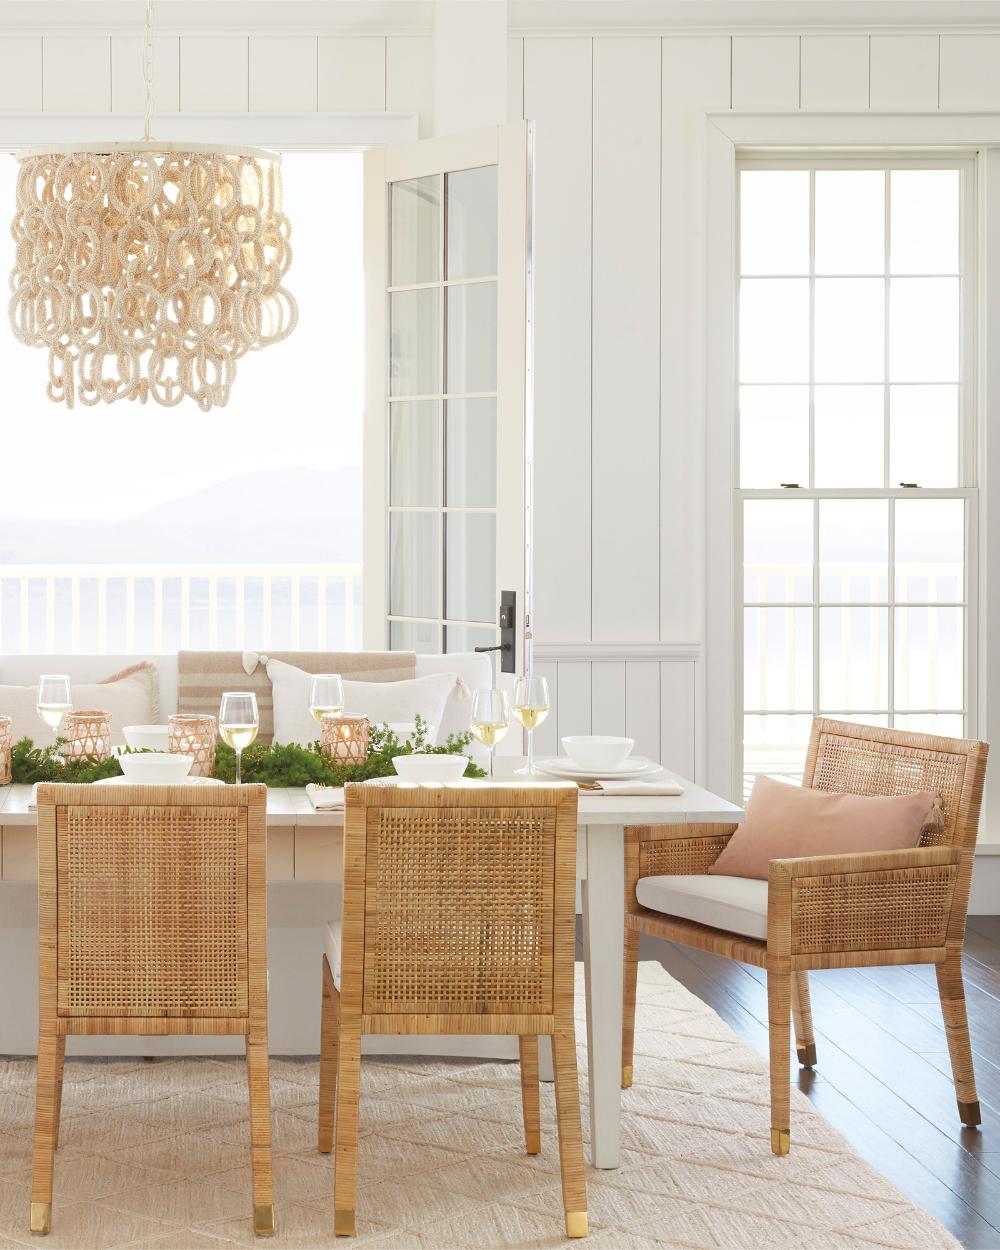 Beach House Expandable Dining Table Home Decor Home Decor Sale